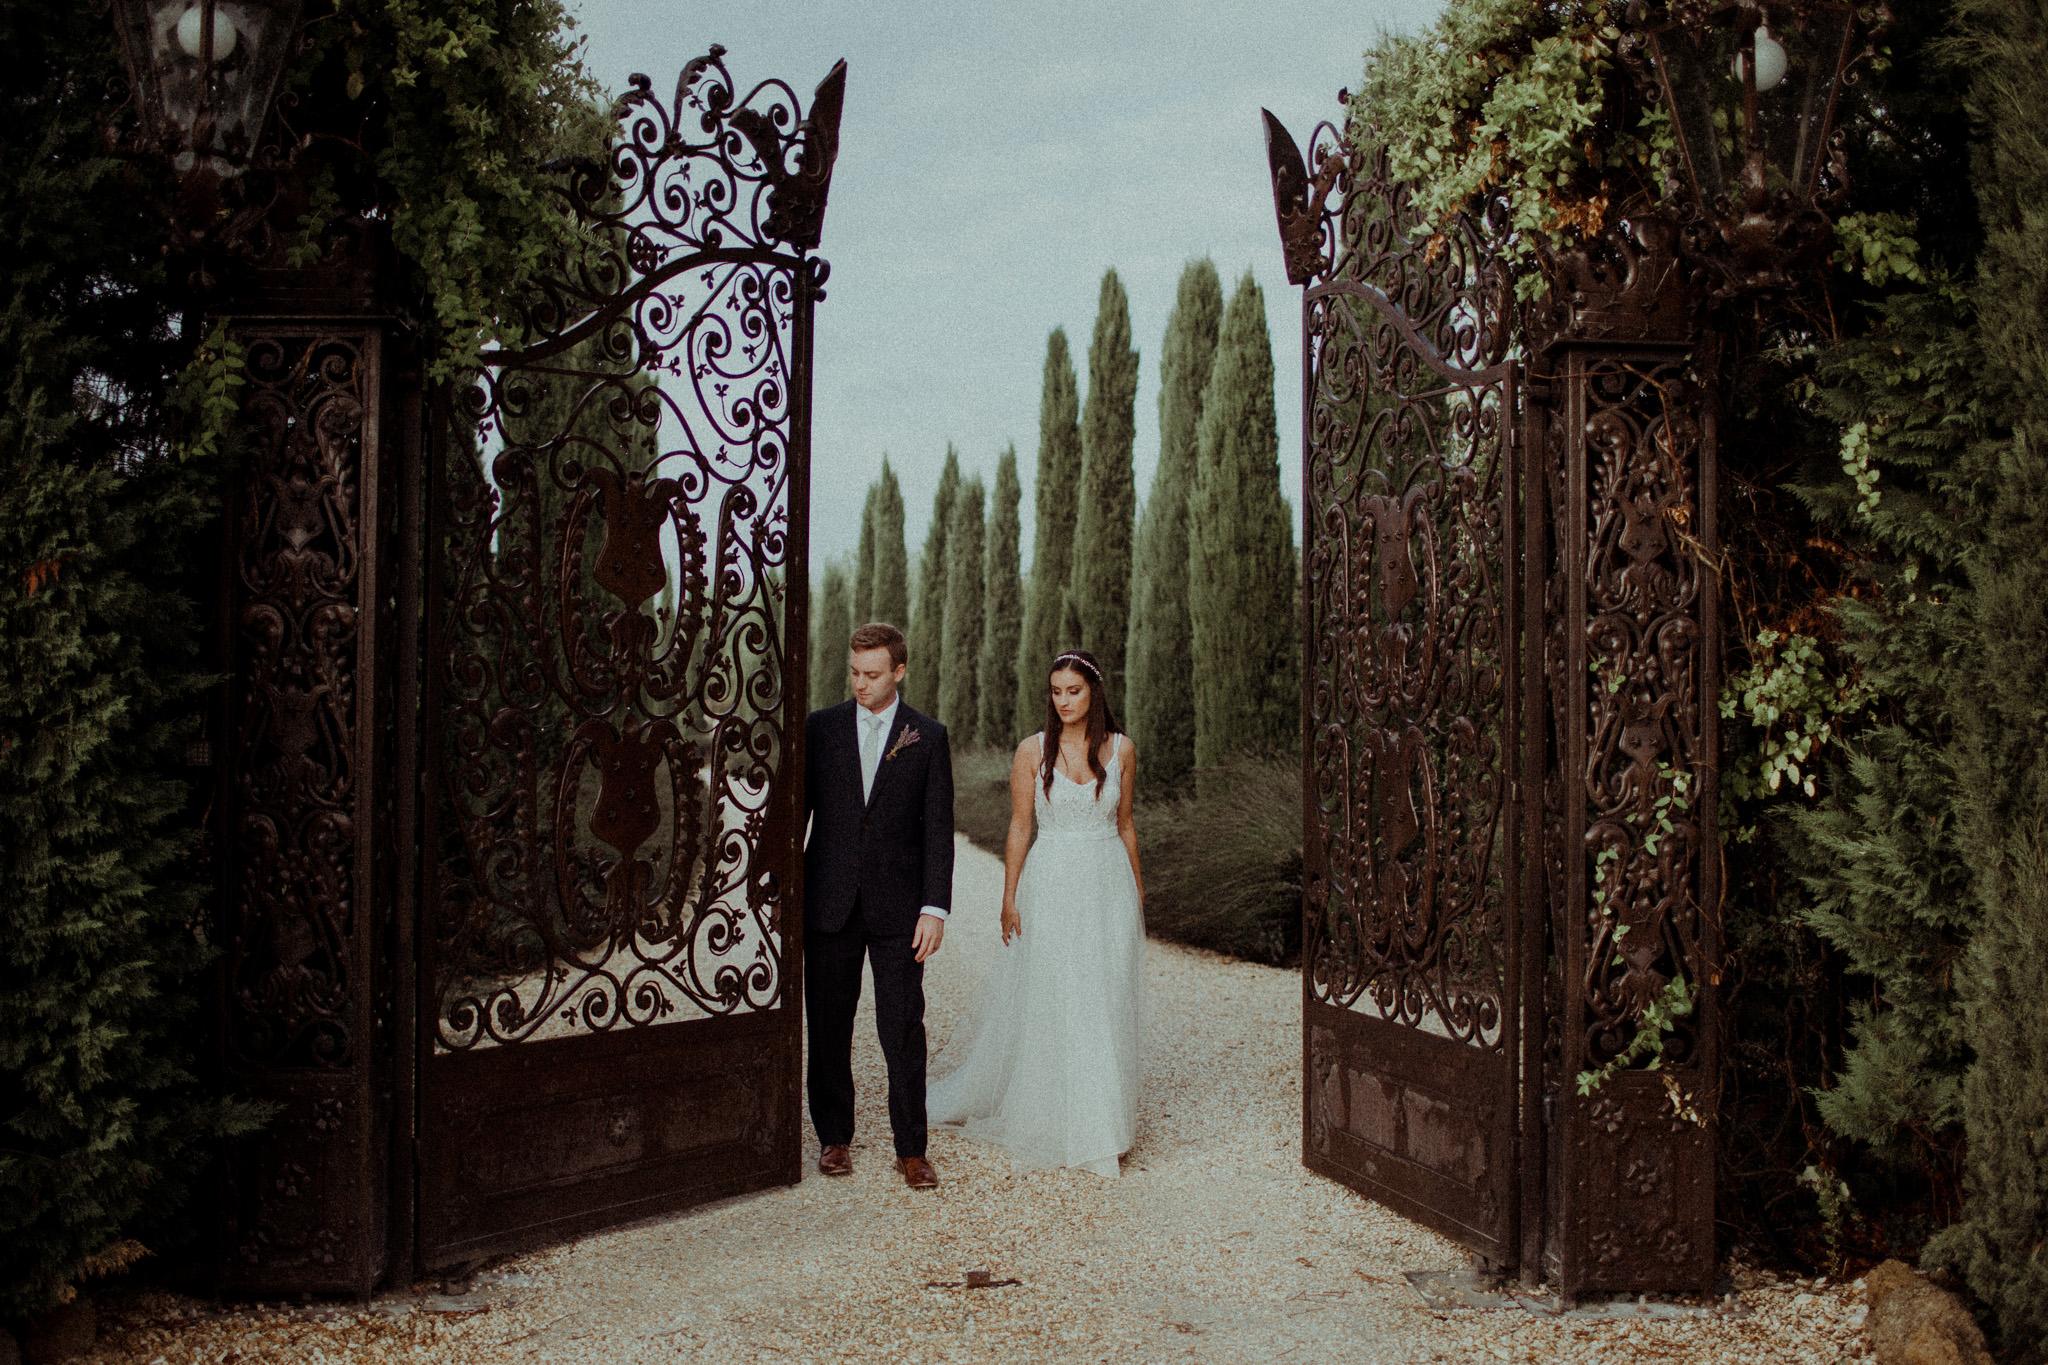 BOHO-ITALIAN-WEDDING-IN-TUSCANY-85.jpg